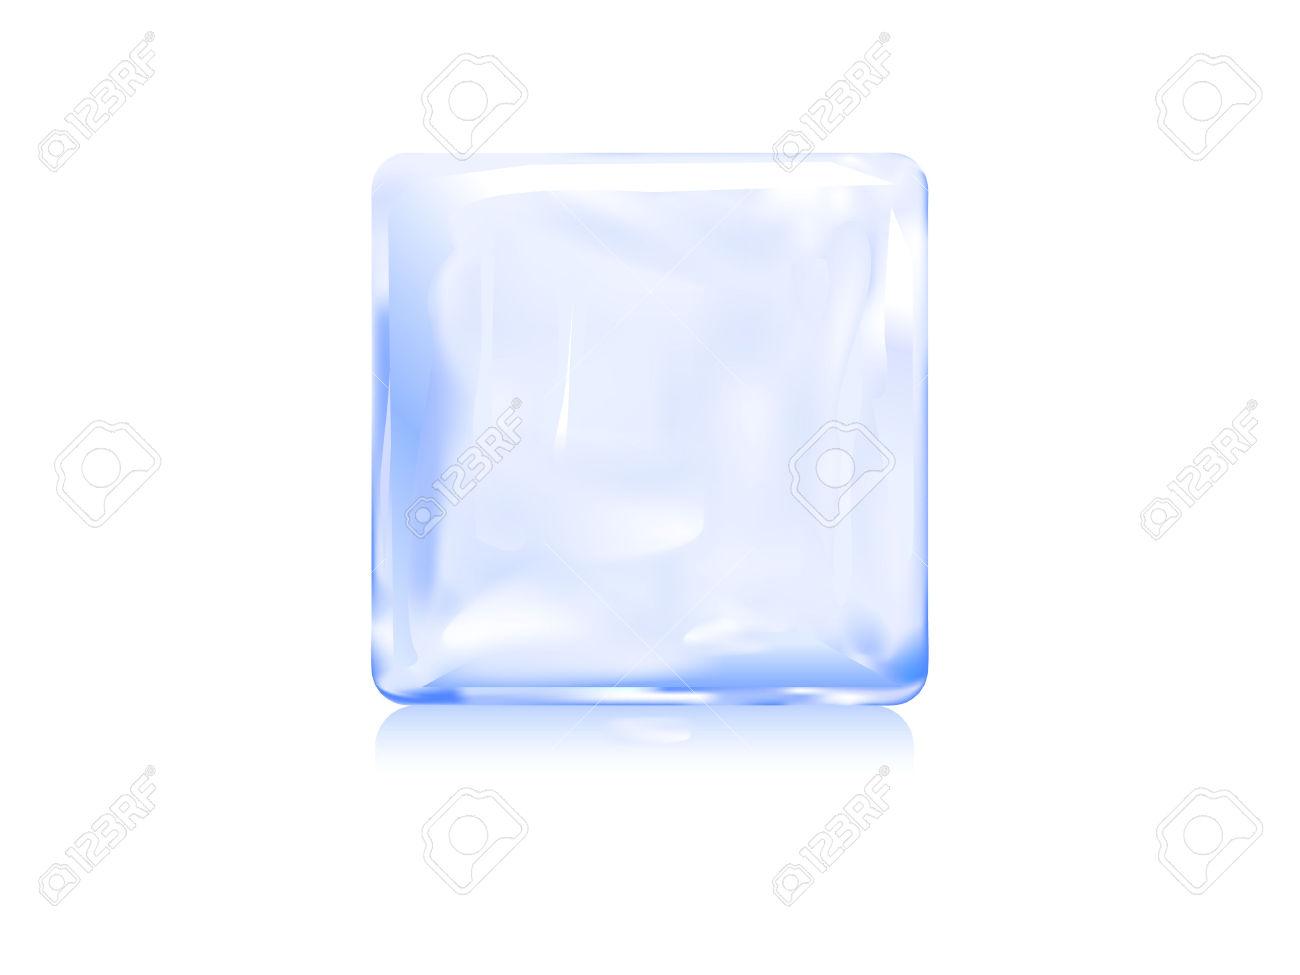 Ice block clipart.